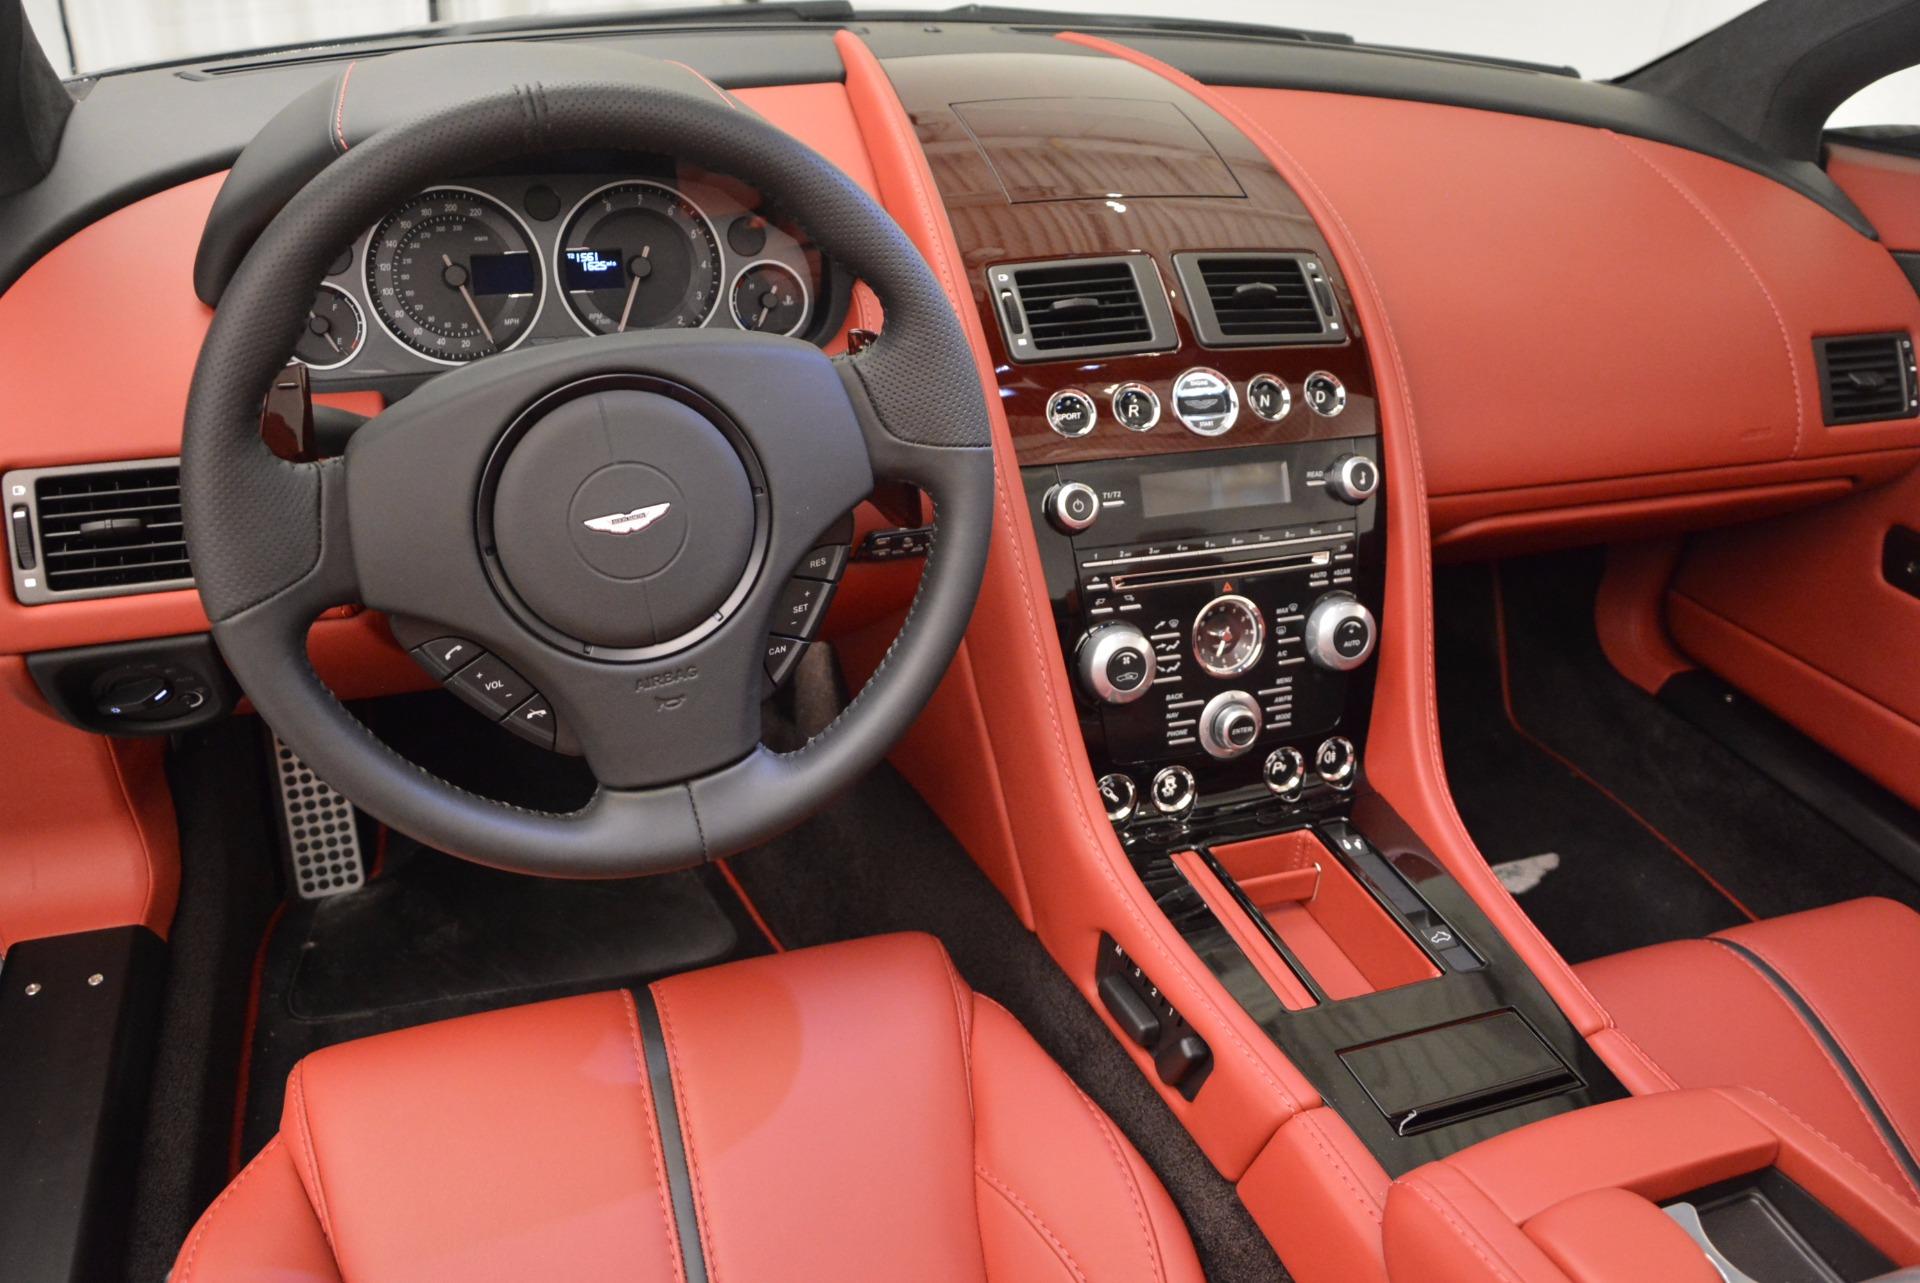 Used 2015 Aston Martin V12 Vantage S Roadster For Sale In Greenwich, CT. Alfa Romeo of Greenwich, 7227 1335_p21